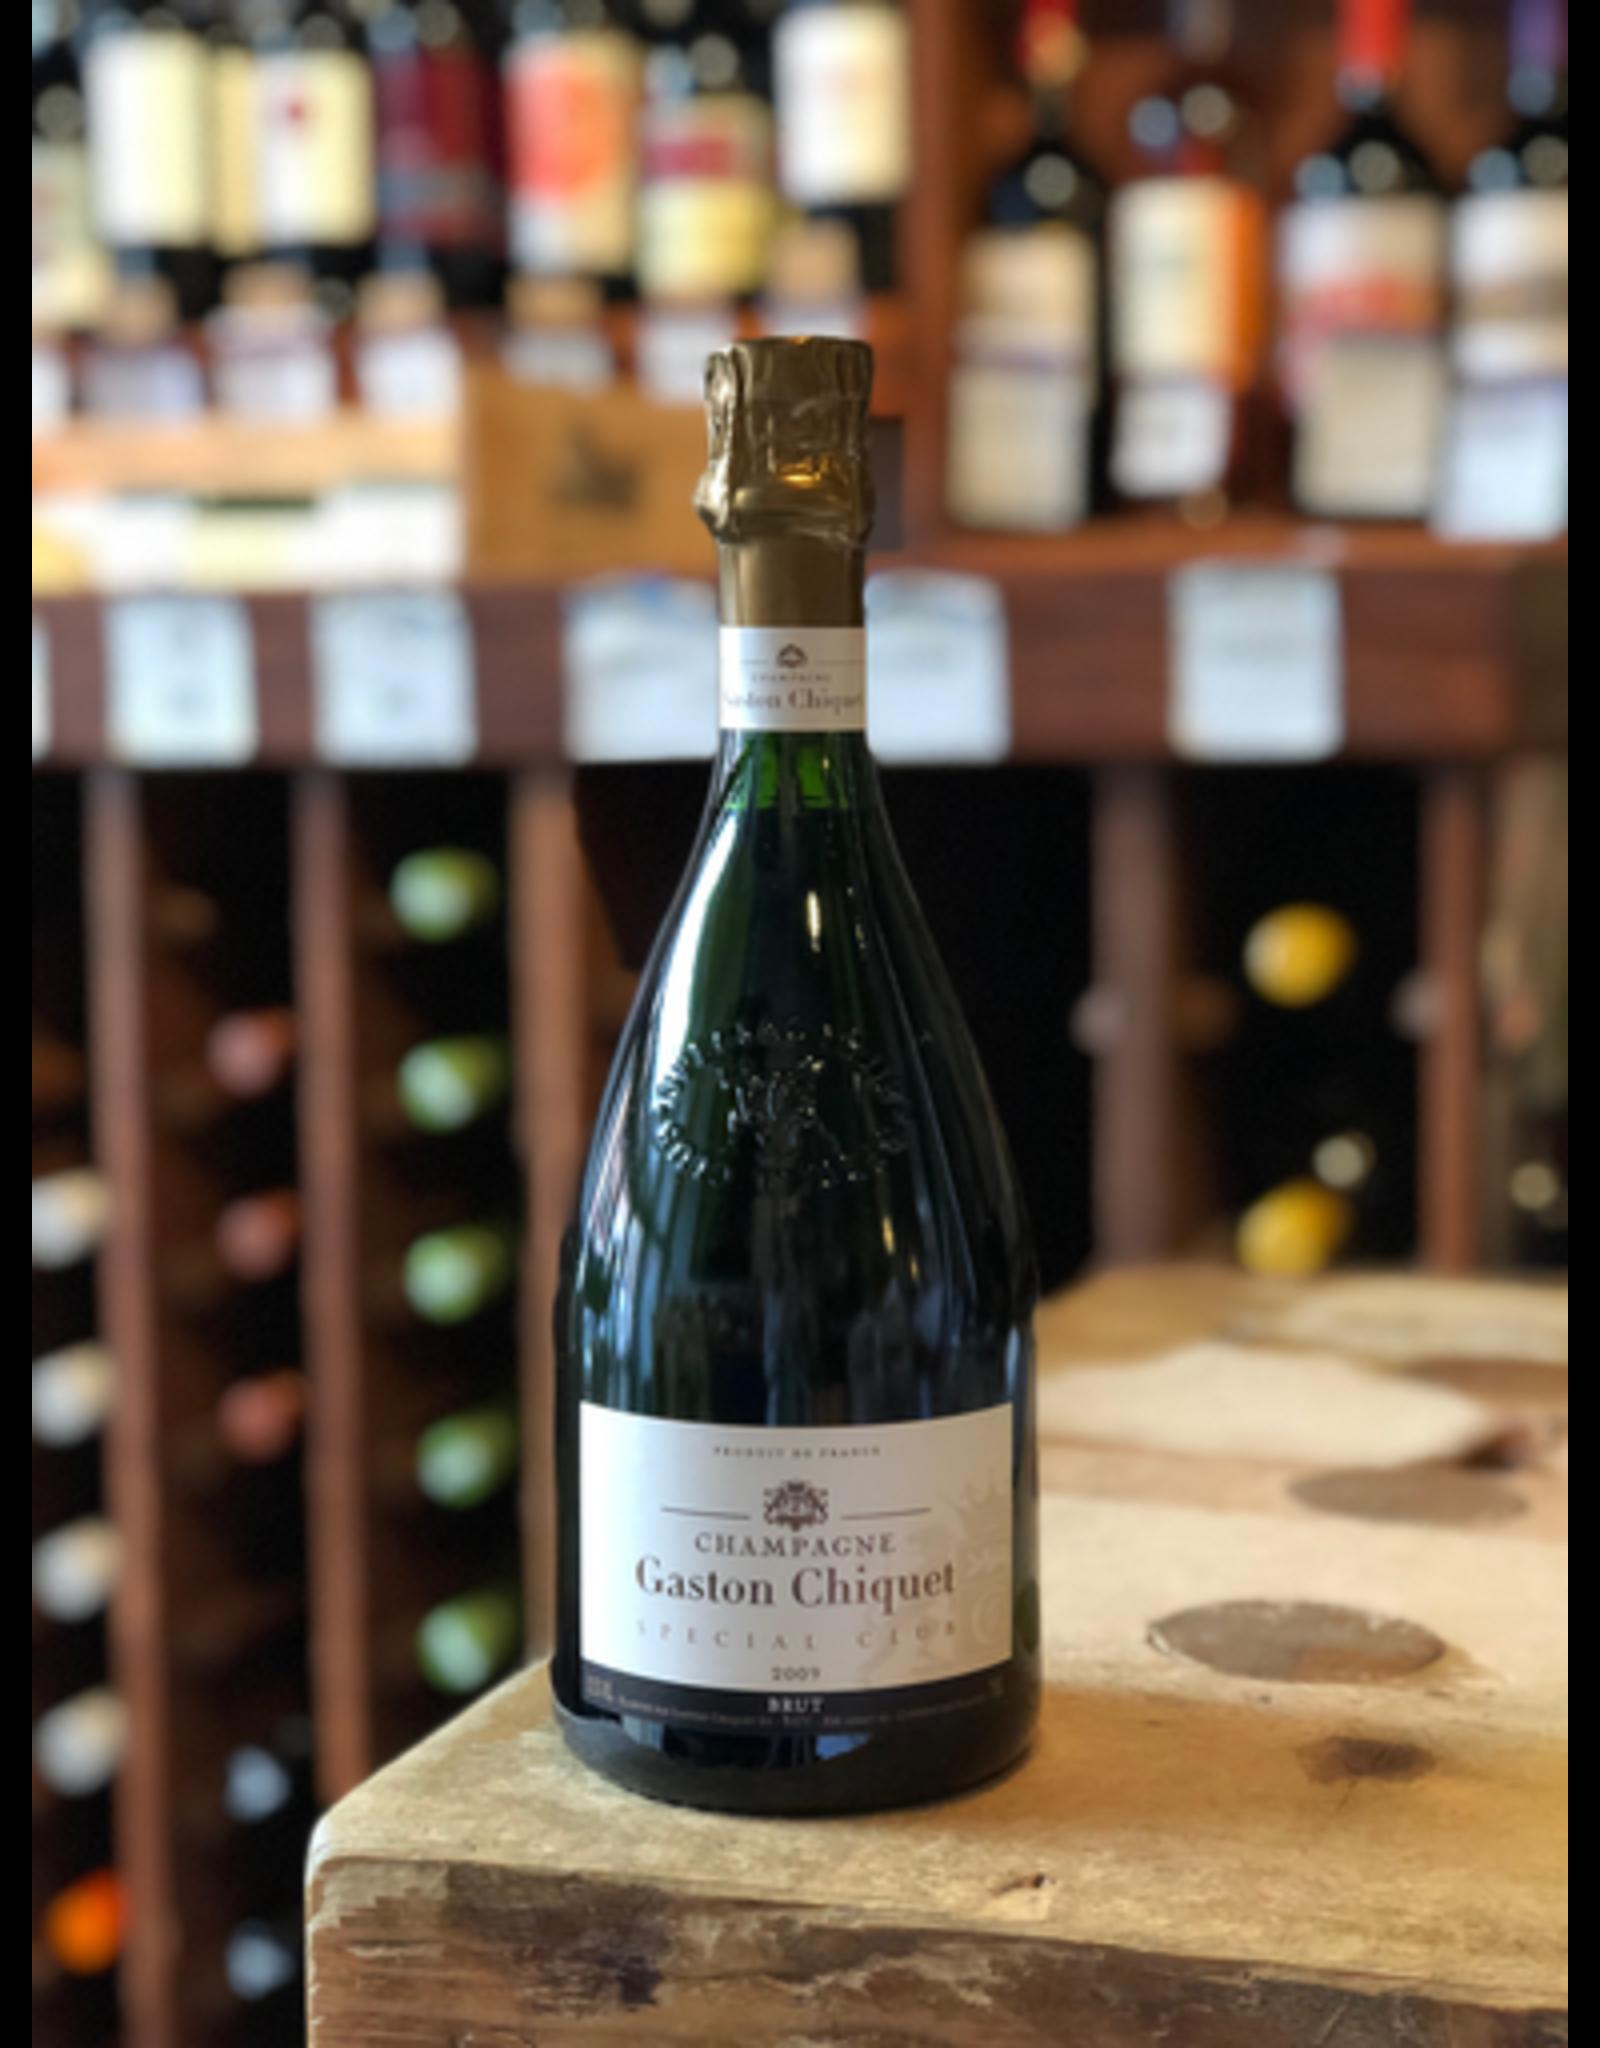 2009 Gaston Chiquet Special Club Millesime Brut - Champagne, France